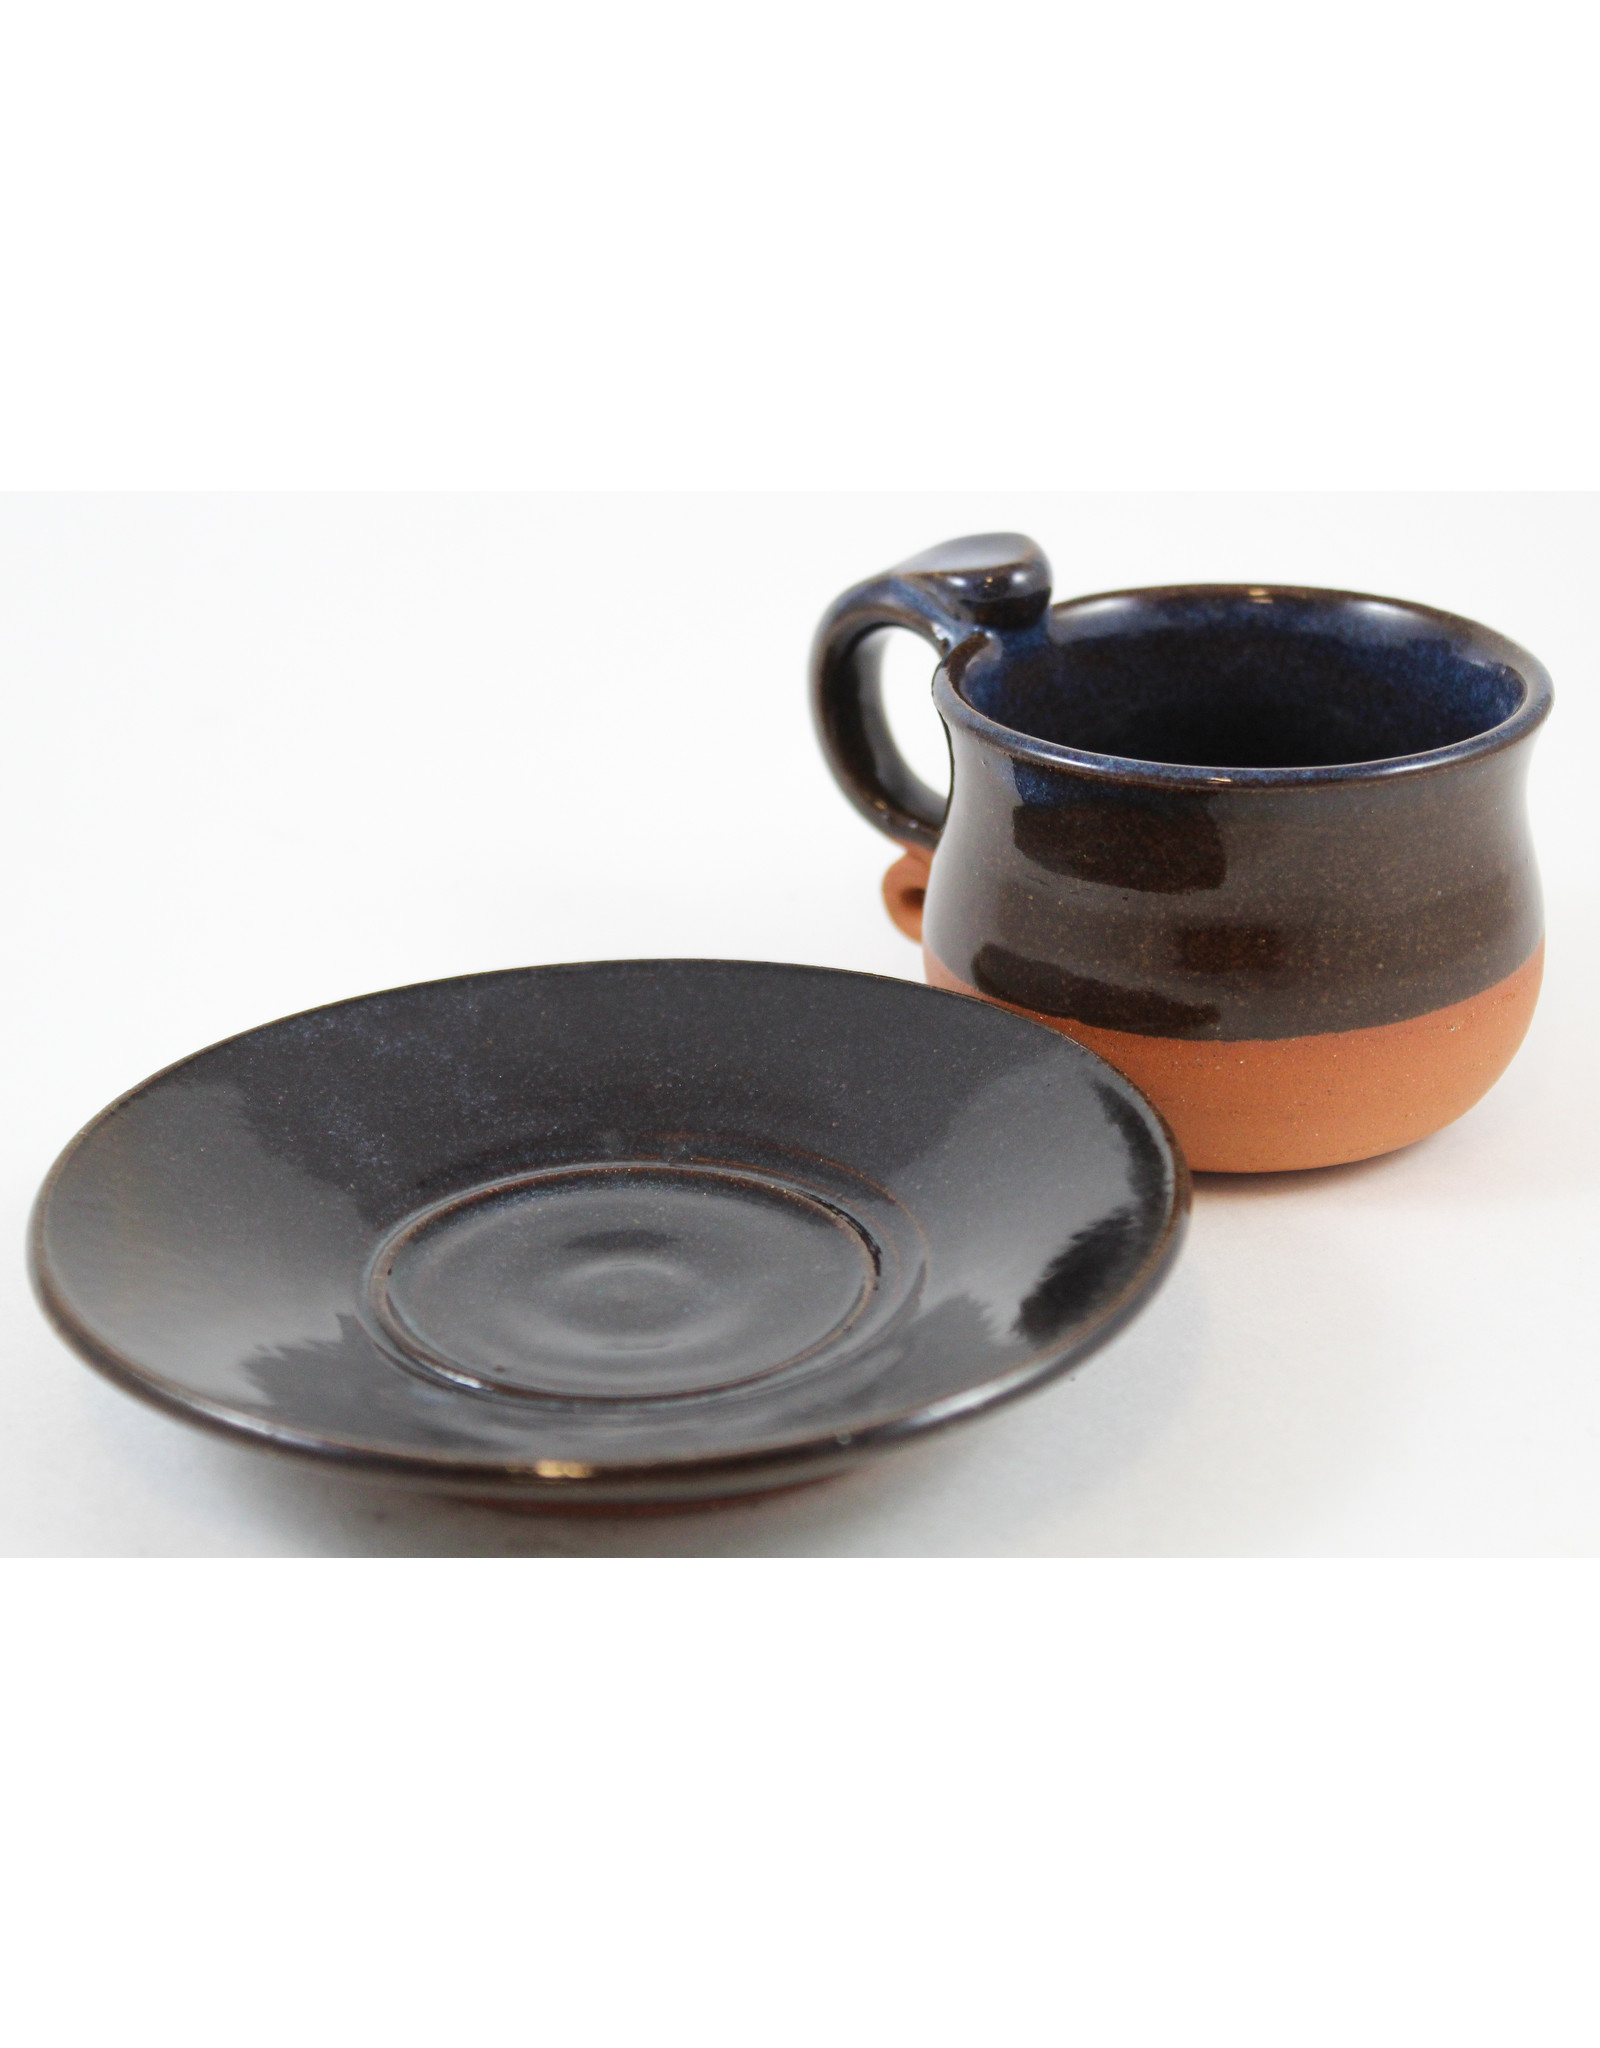 Jitka Zgola Espresso Cup and Saucer by Jitka Zgola